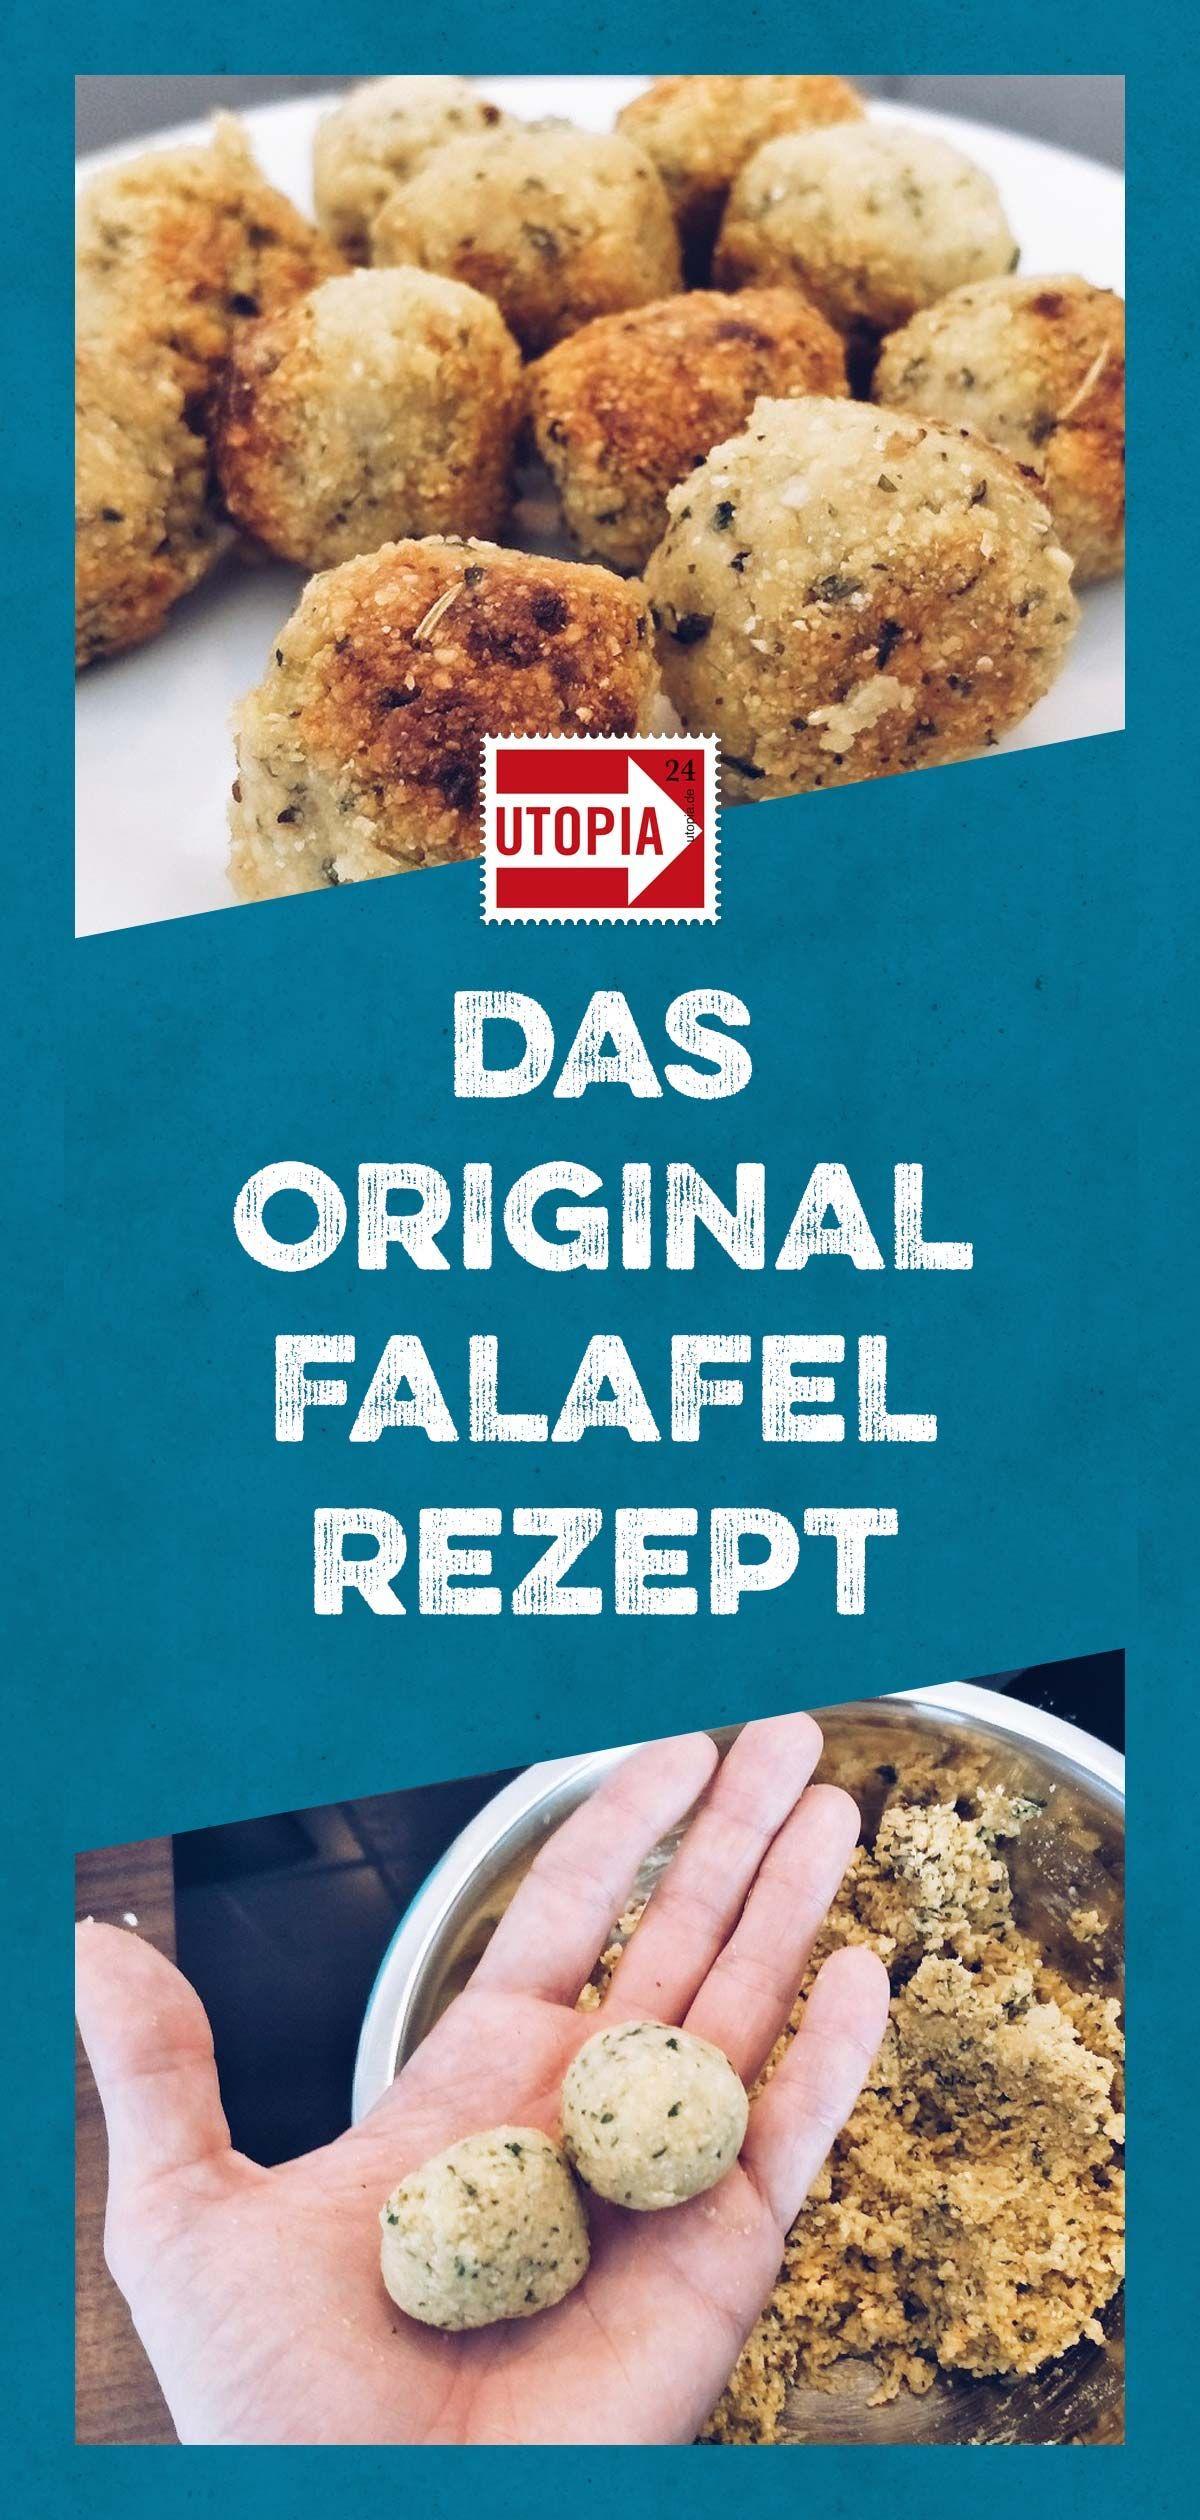 Falafel-Rezept: Das Original - Utopia.de #kartoffelnofen